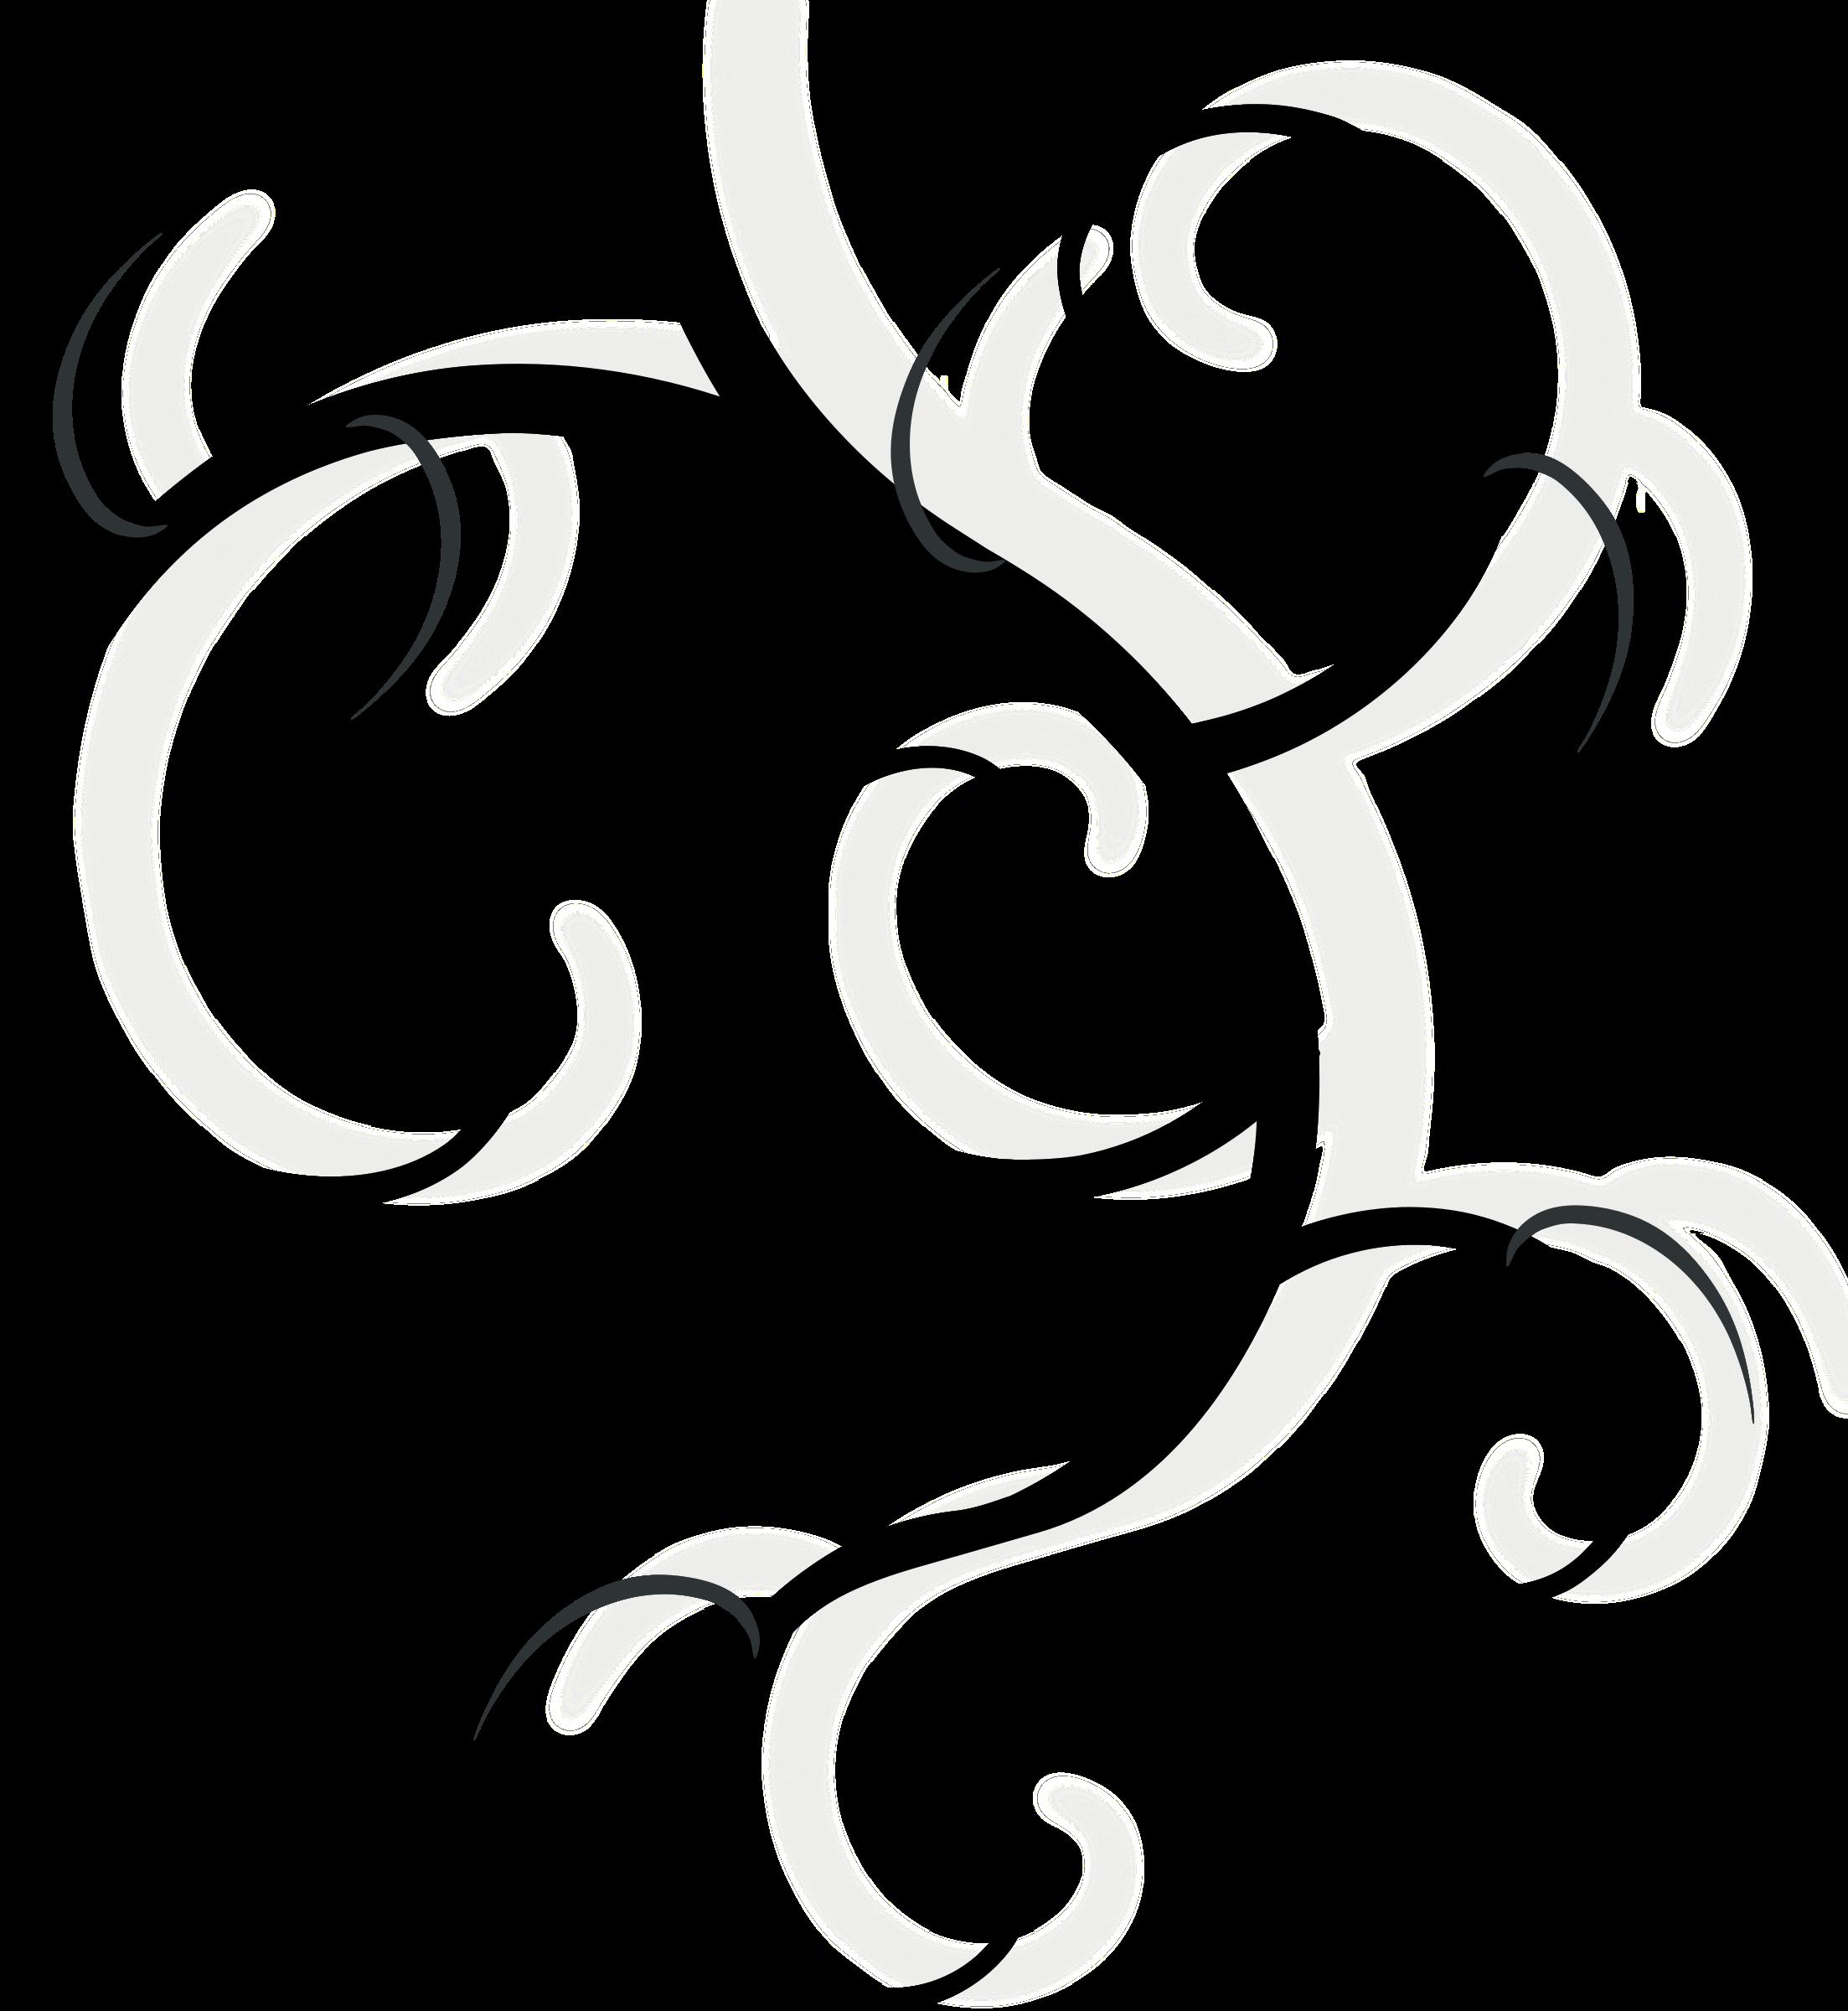 Vines clipart swirl. Design element big image